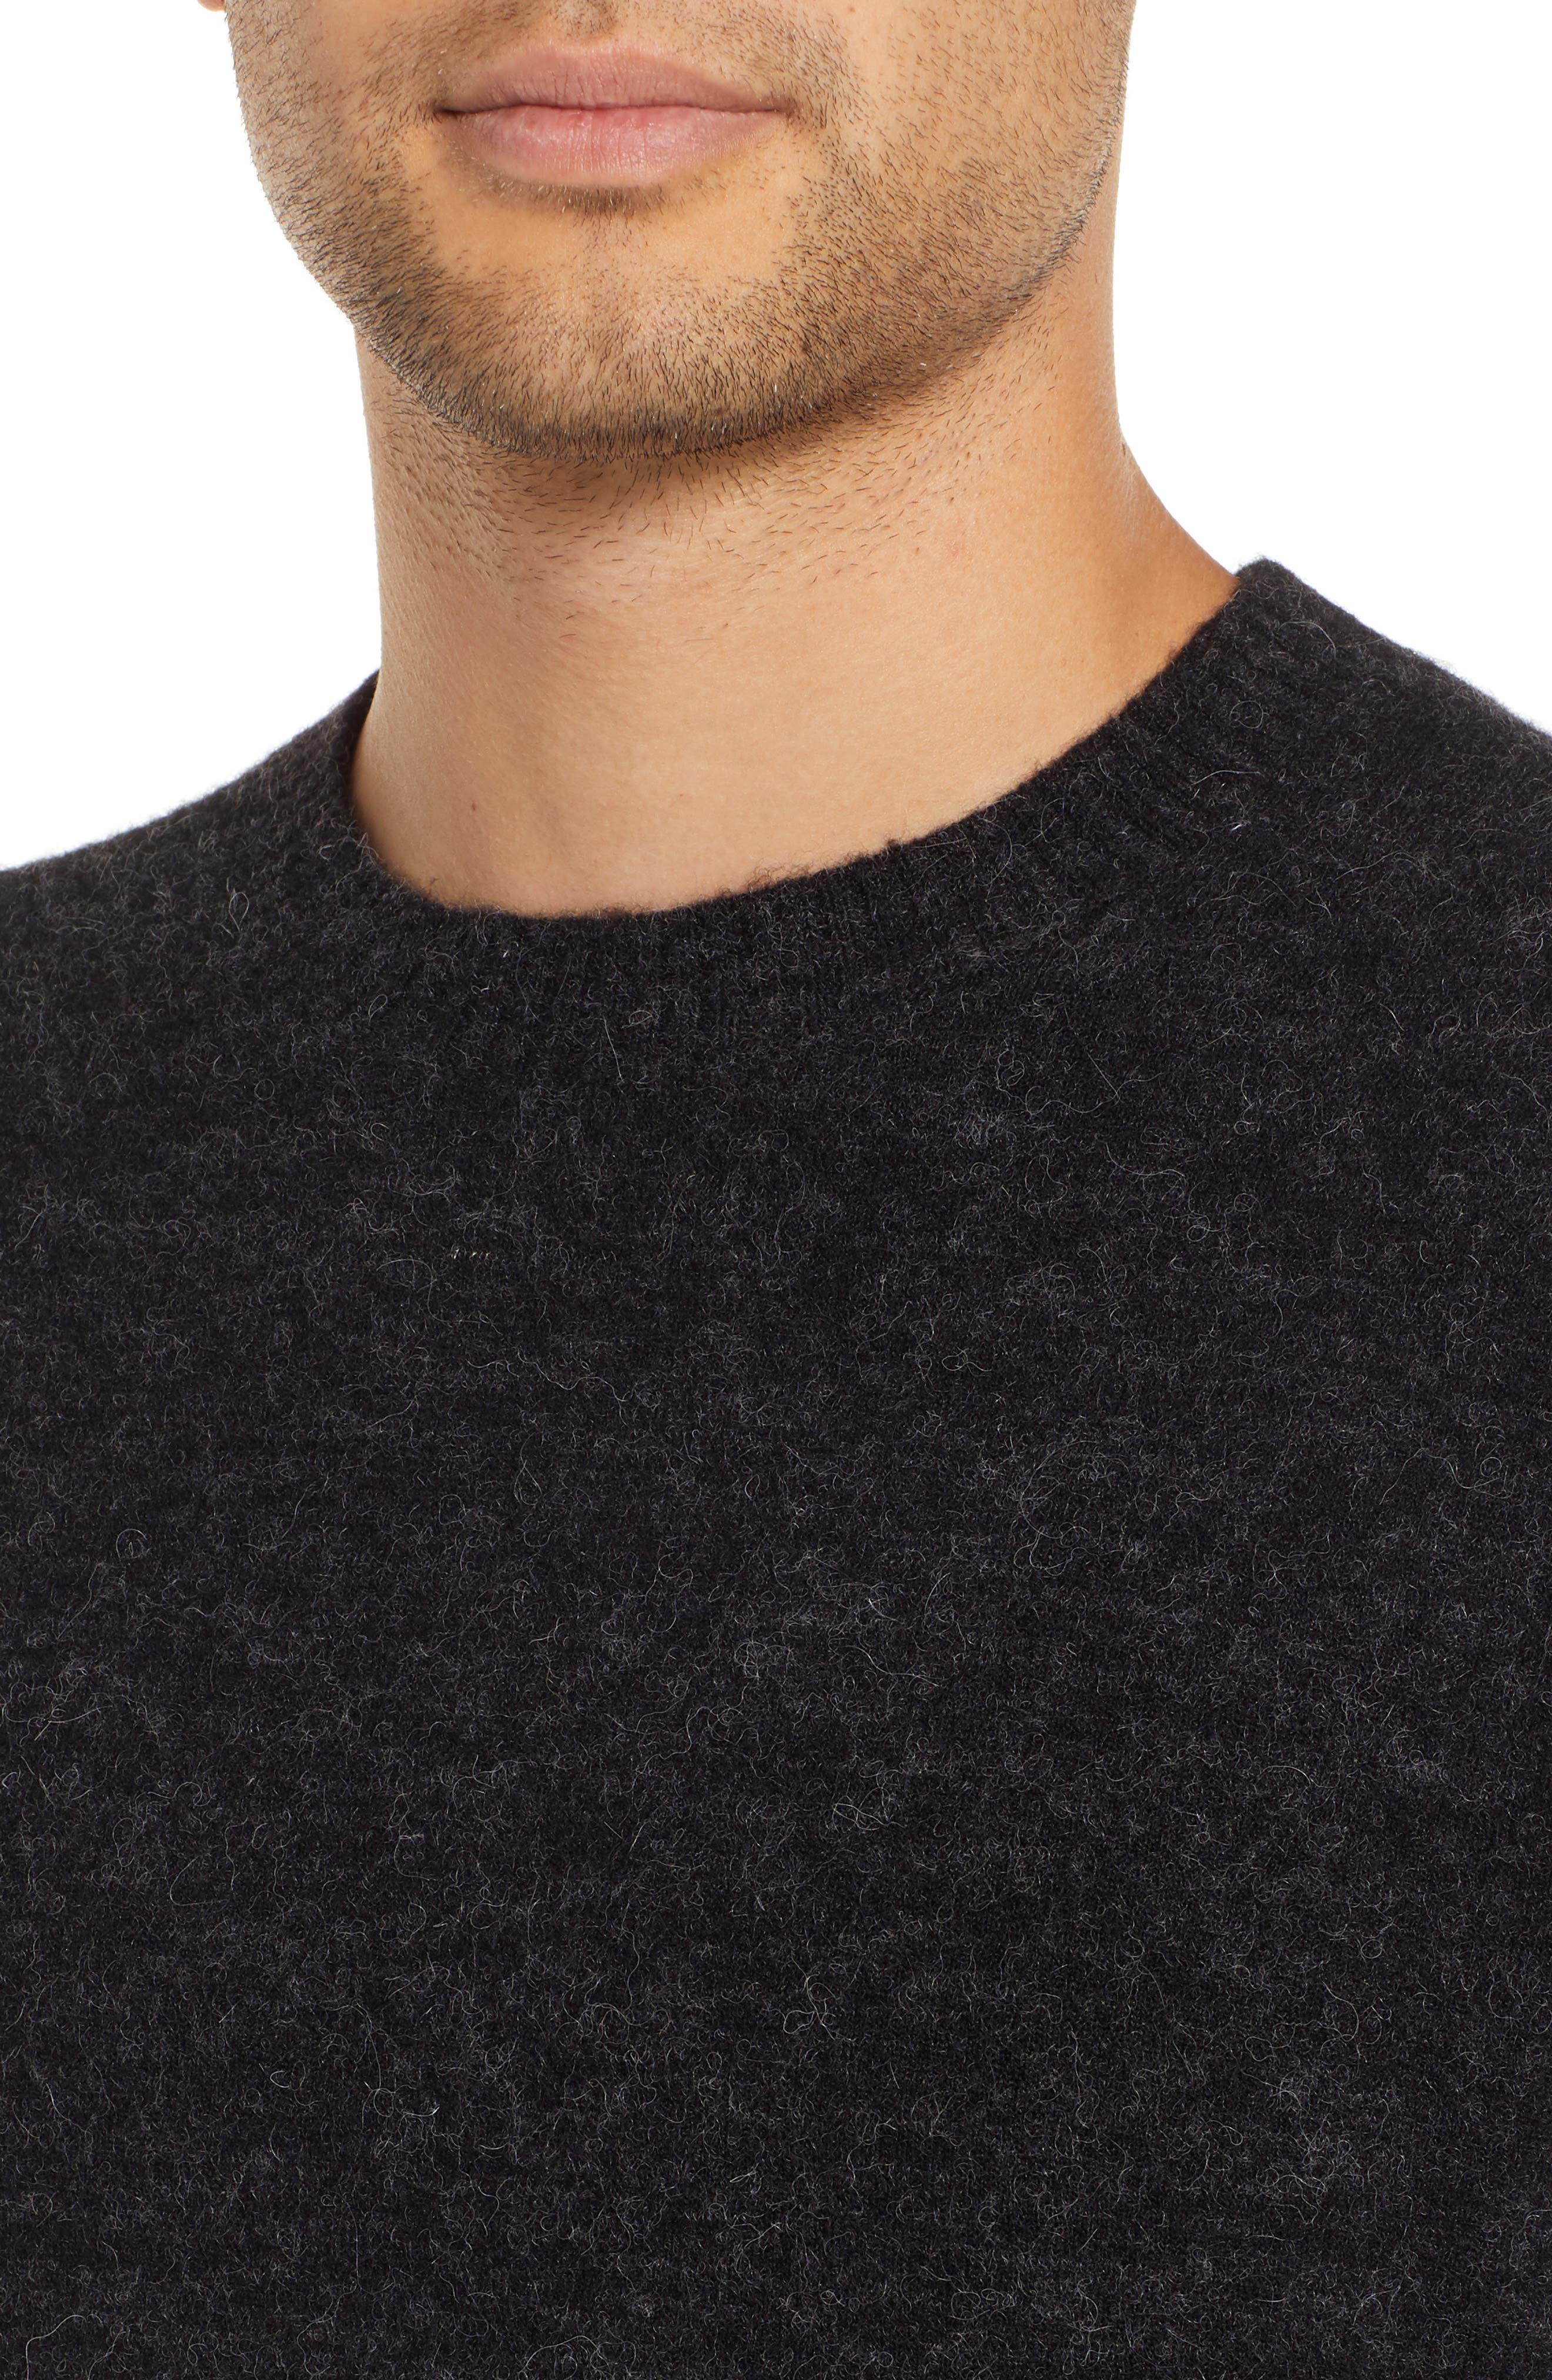 Seridon Oversize Crewneck Sweater,                             Alternate thumbnail 4, color,                             020